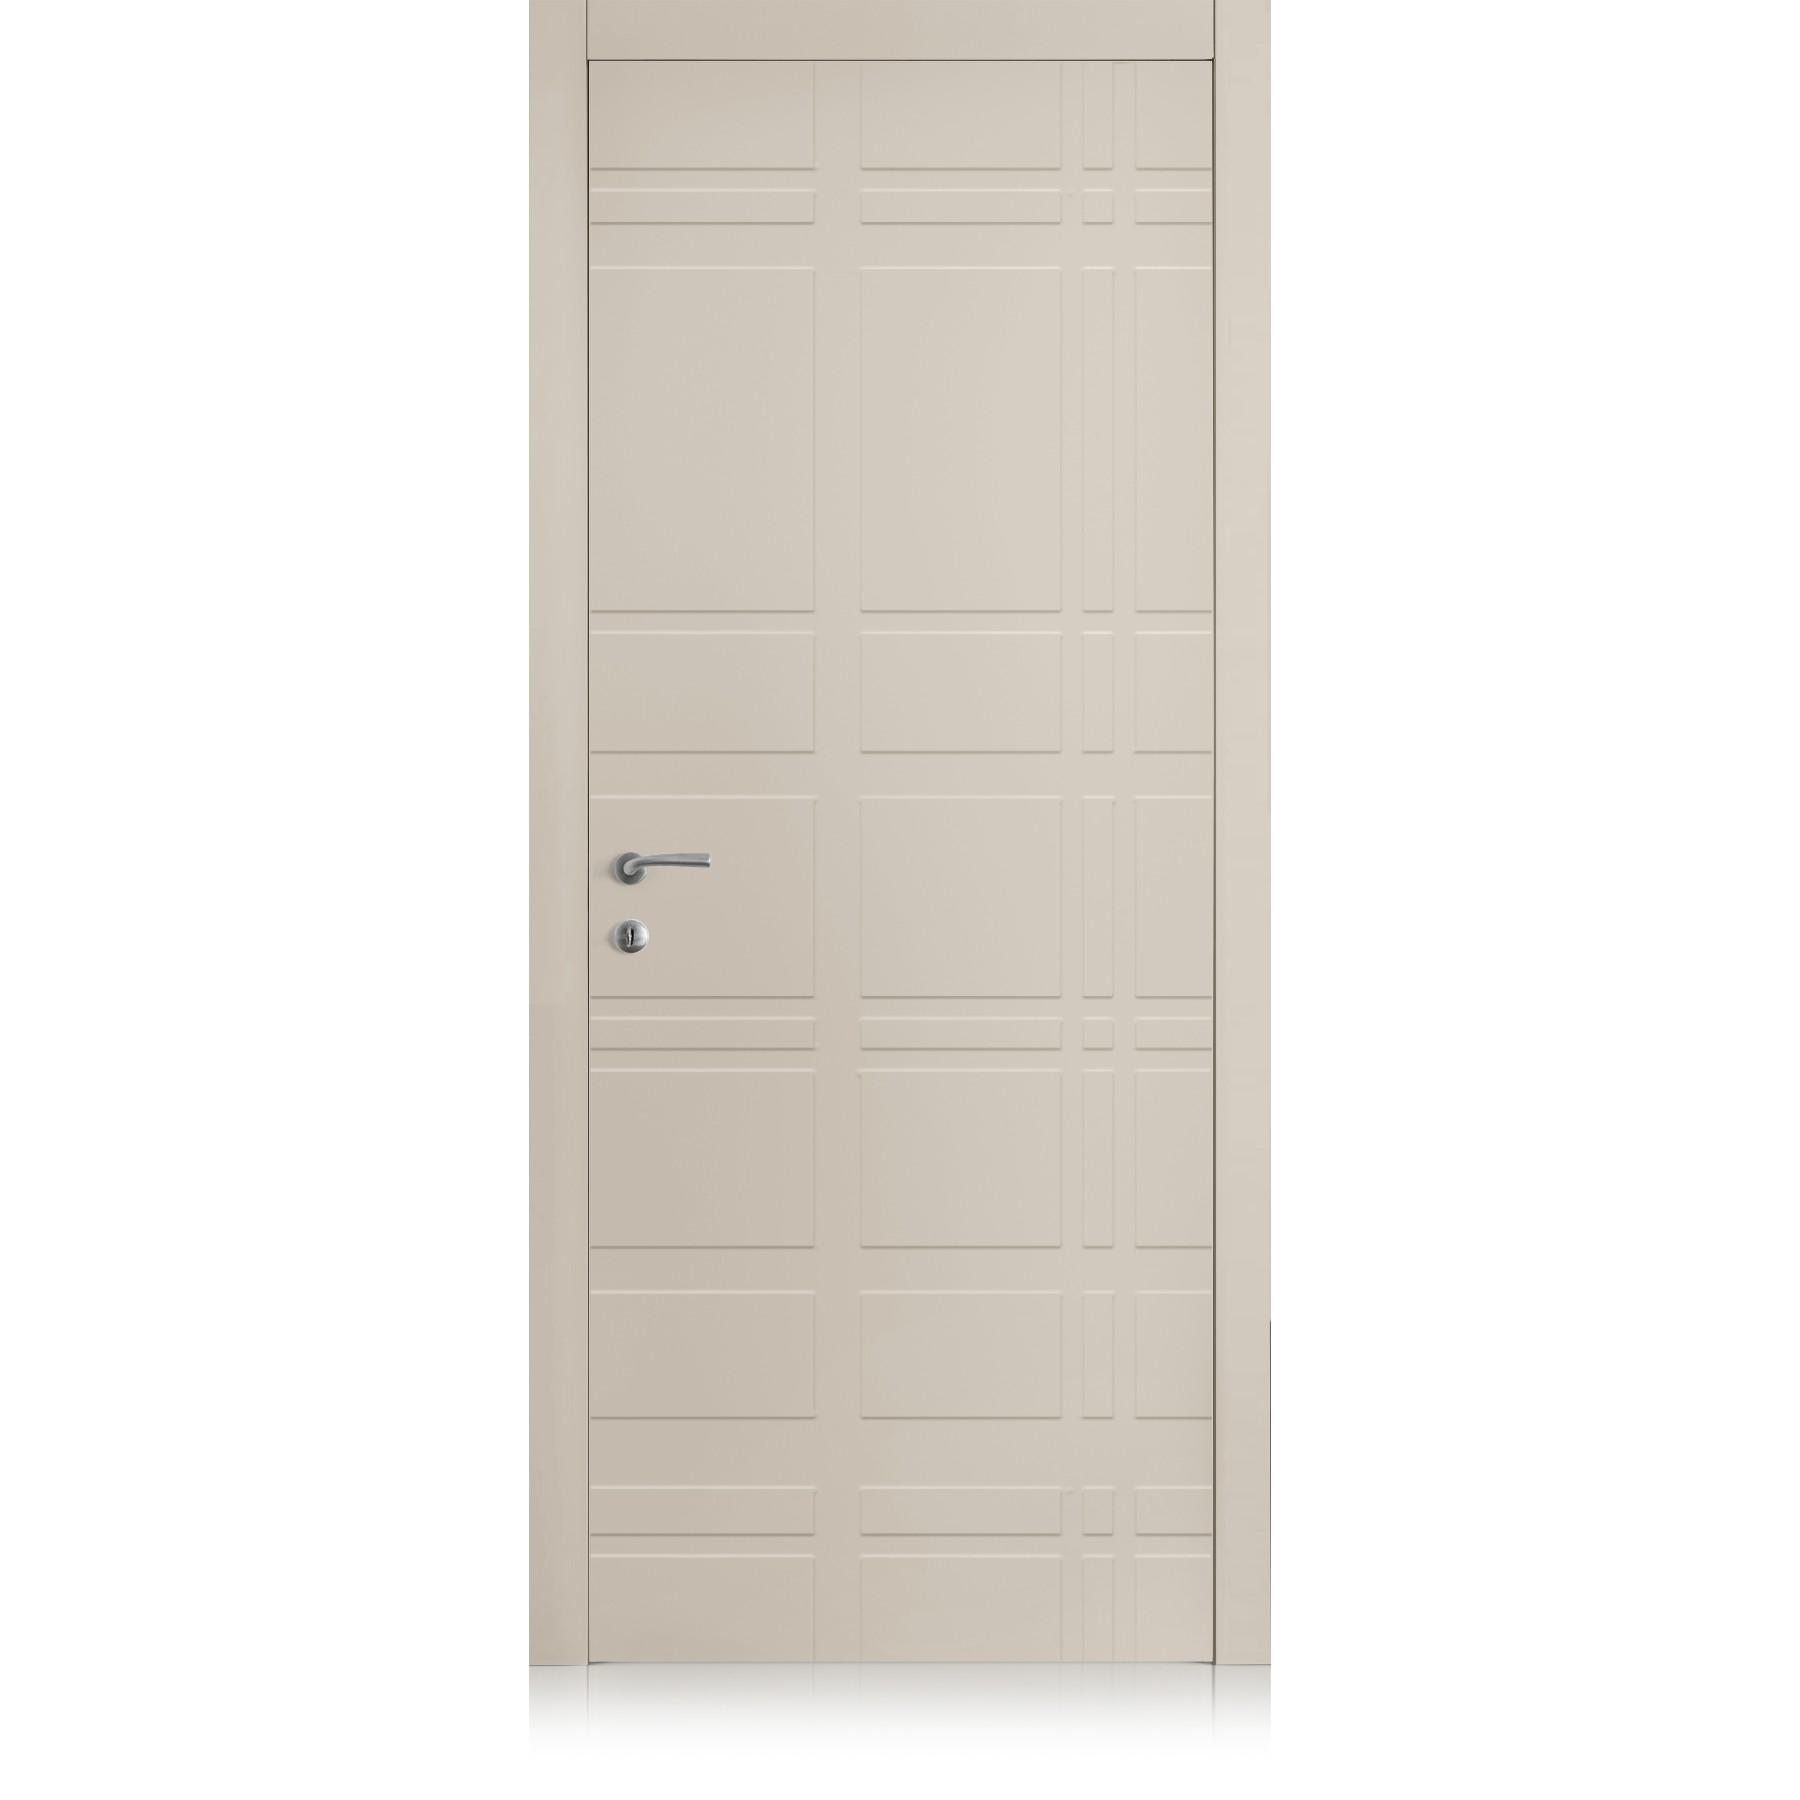 Yncisa Tartan Tortora Laccato ULTRAopaco door